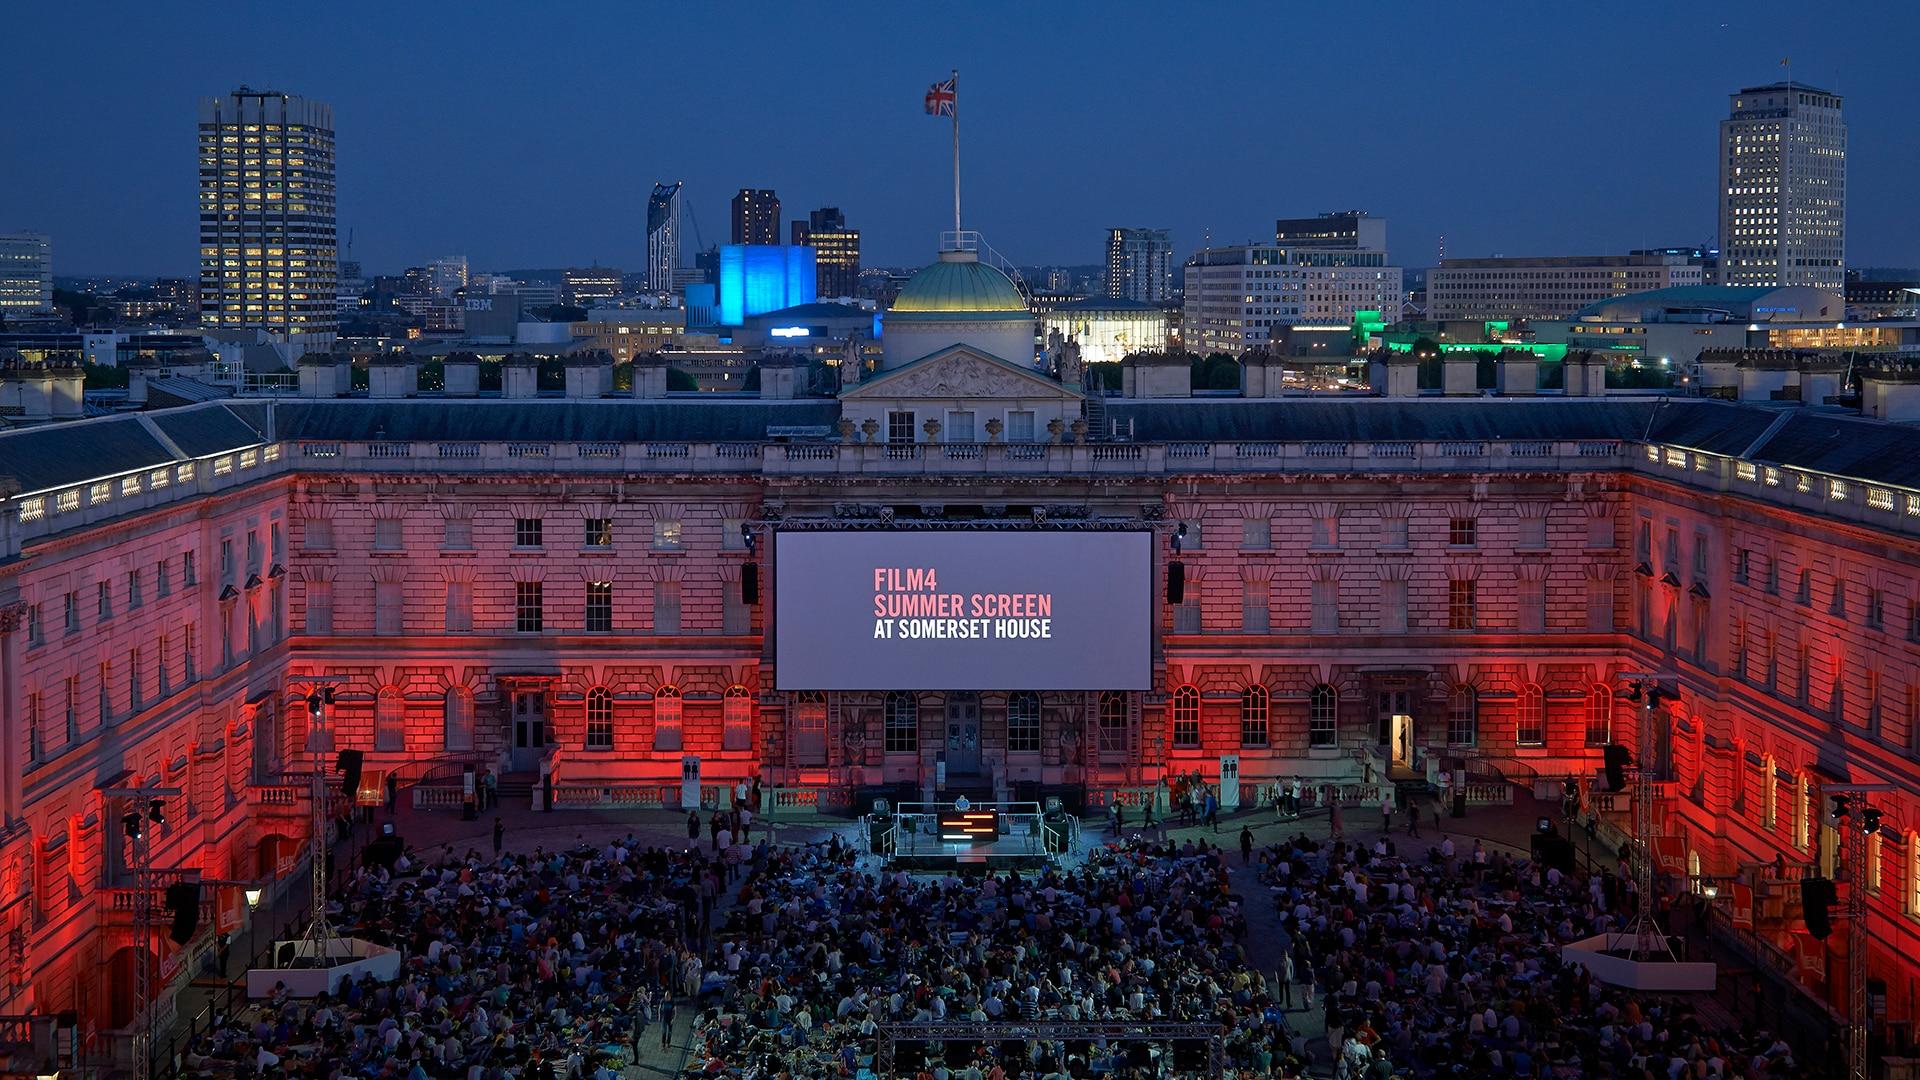 Film4 Summer Screen at Somerset House 2018